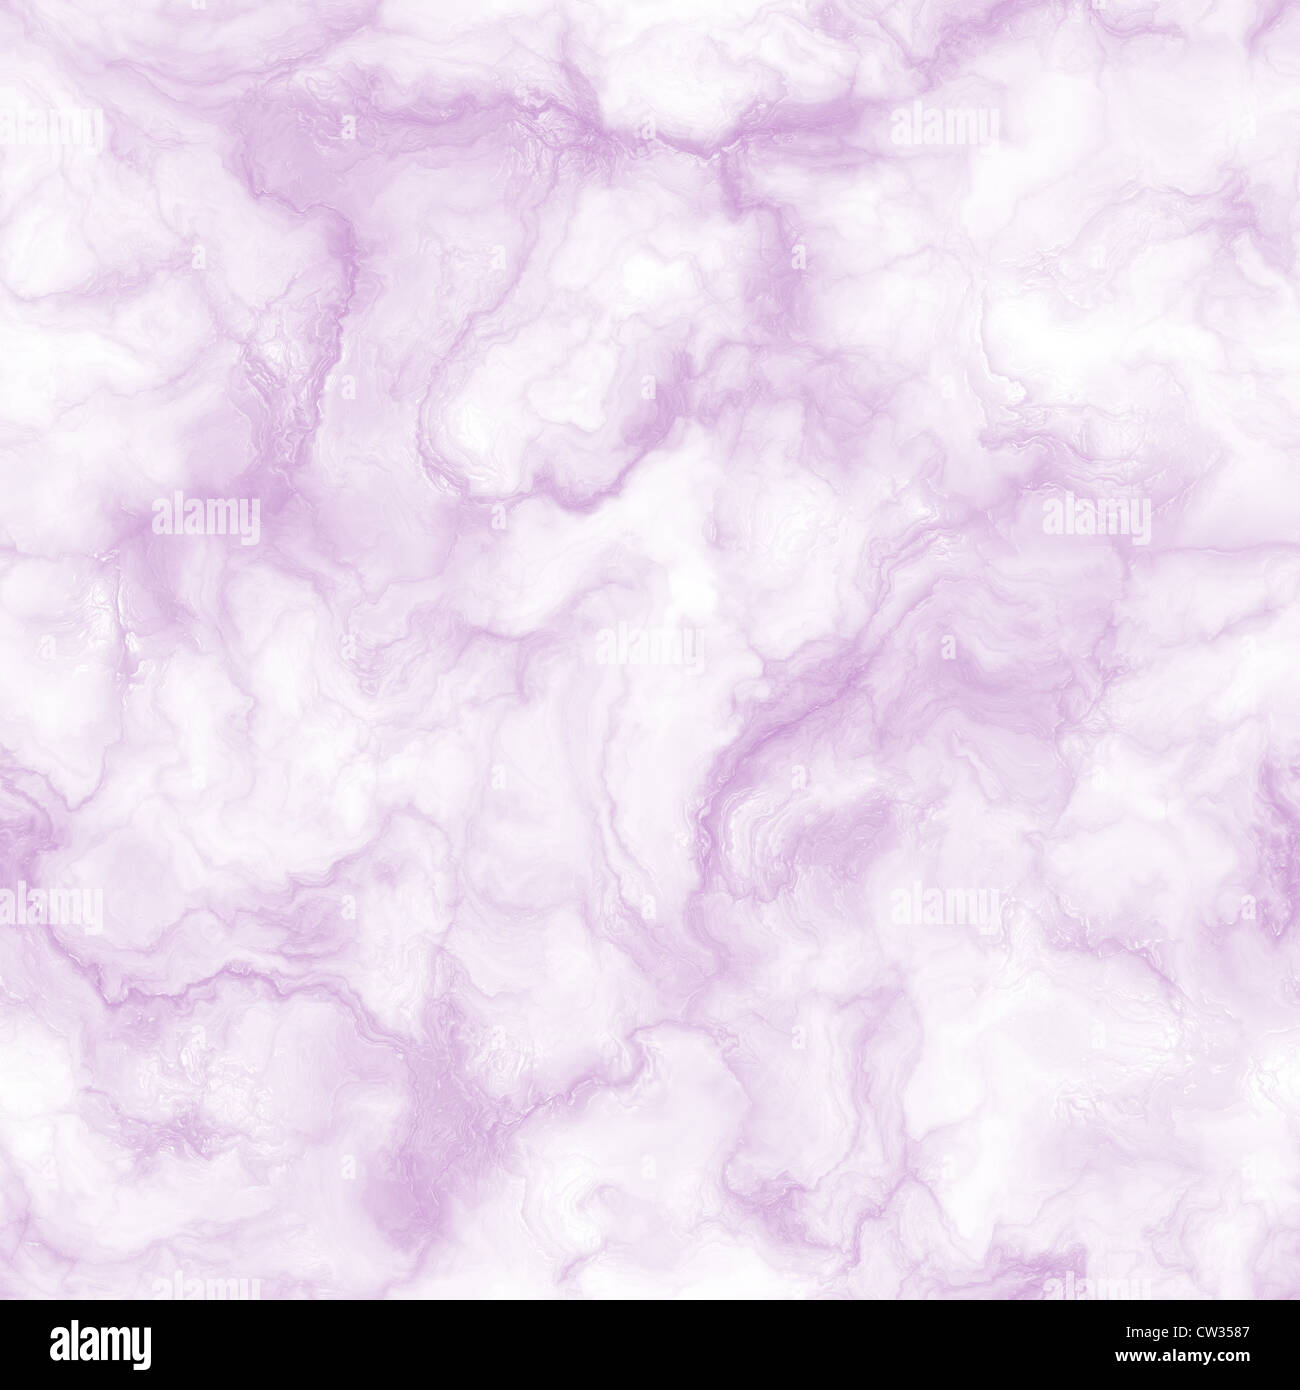 Good Wallpaper Marble Purple - light-purple-marble-seamless-background-CW3587  Trends_948745.jpg